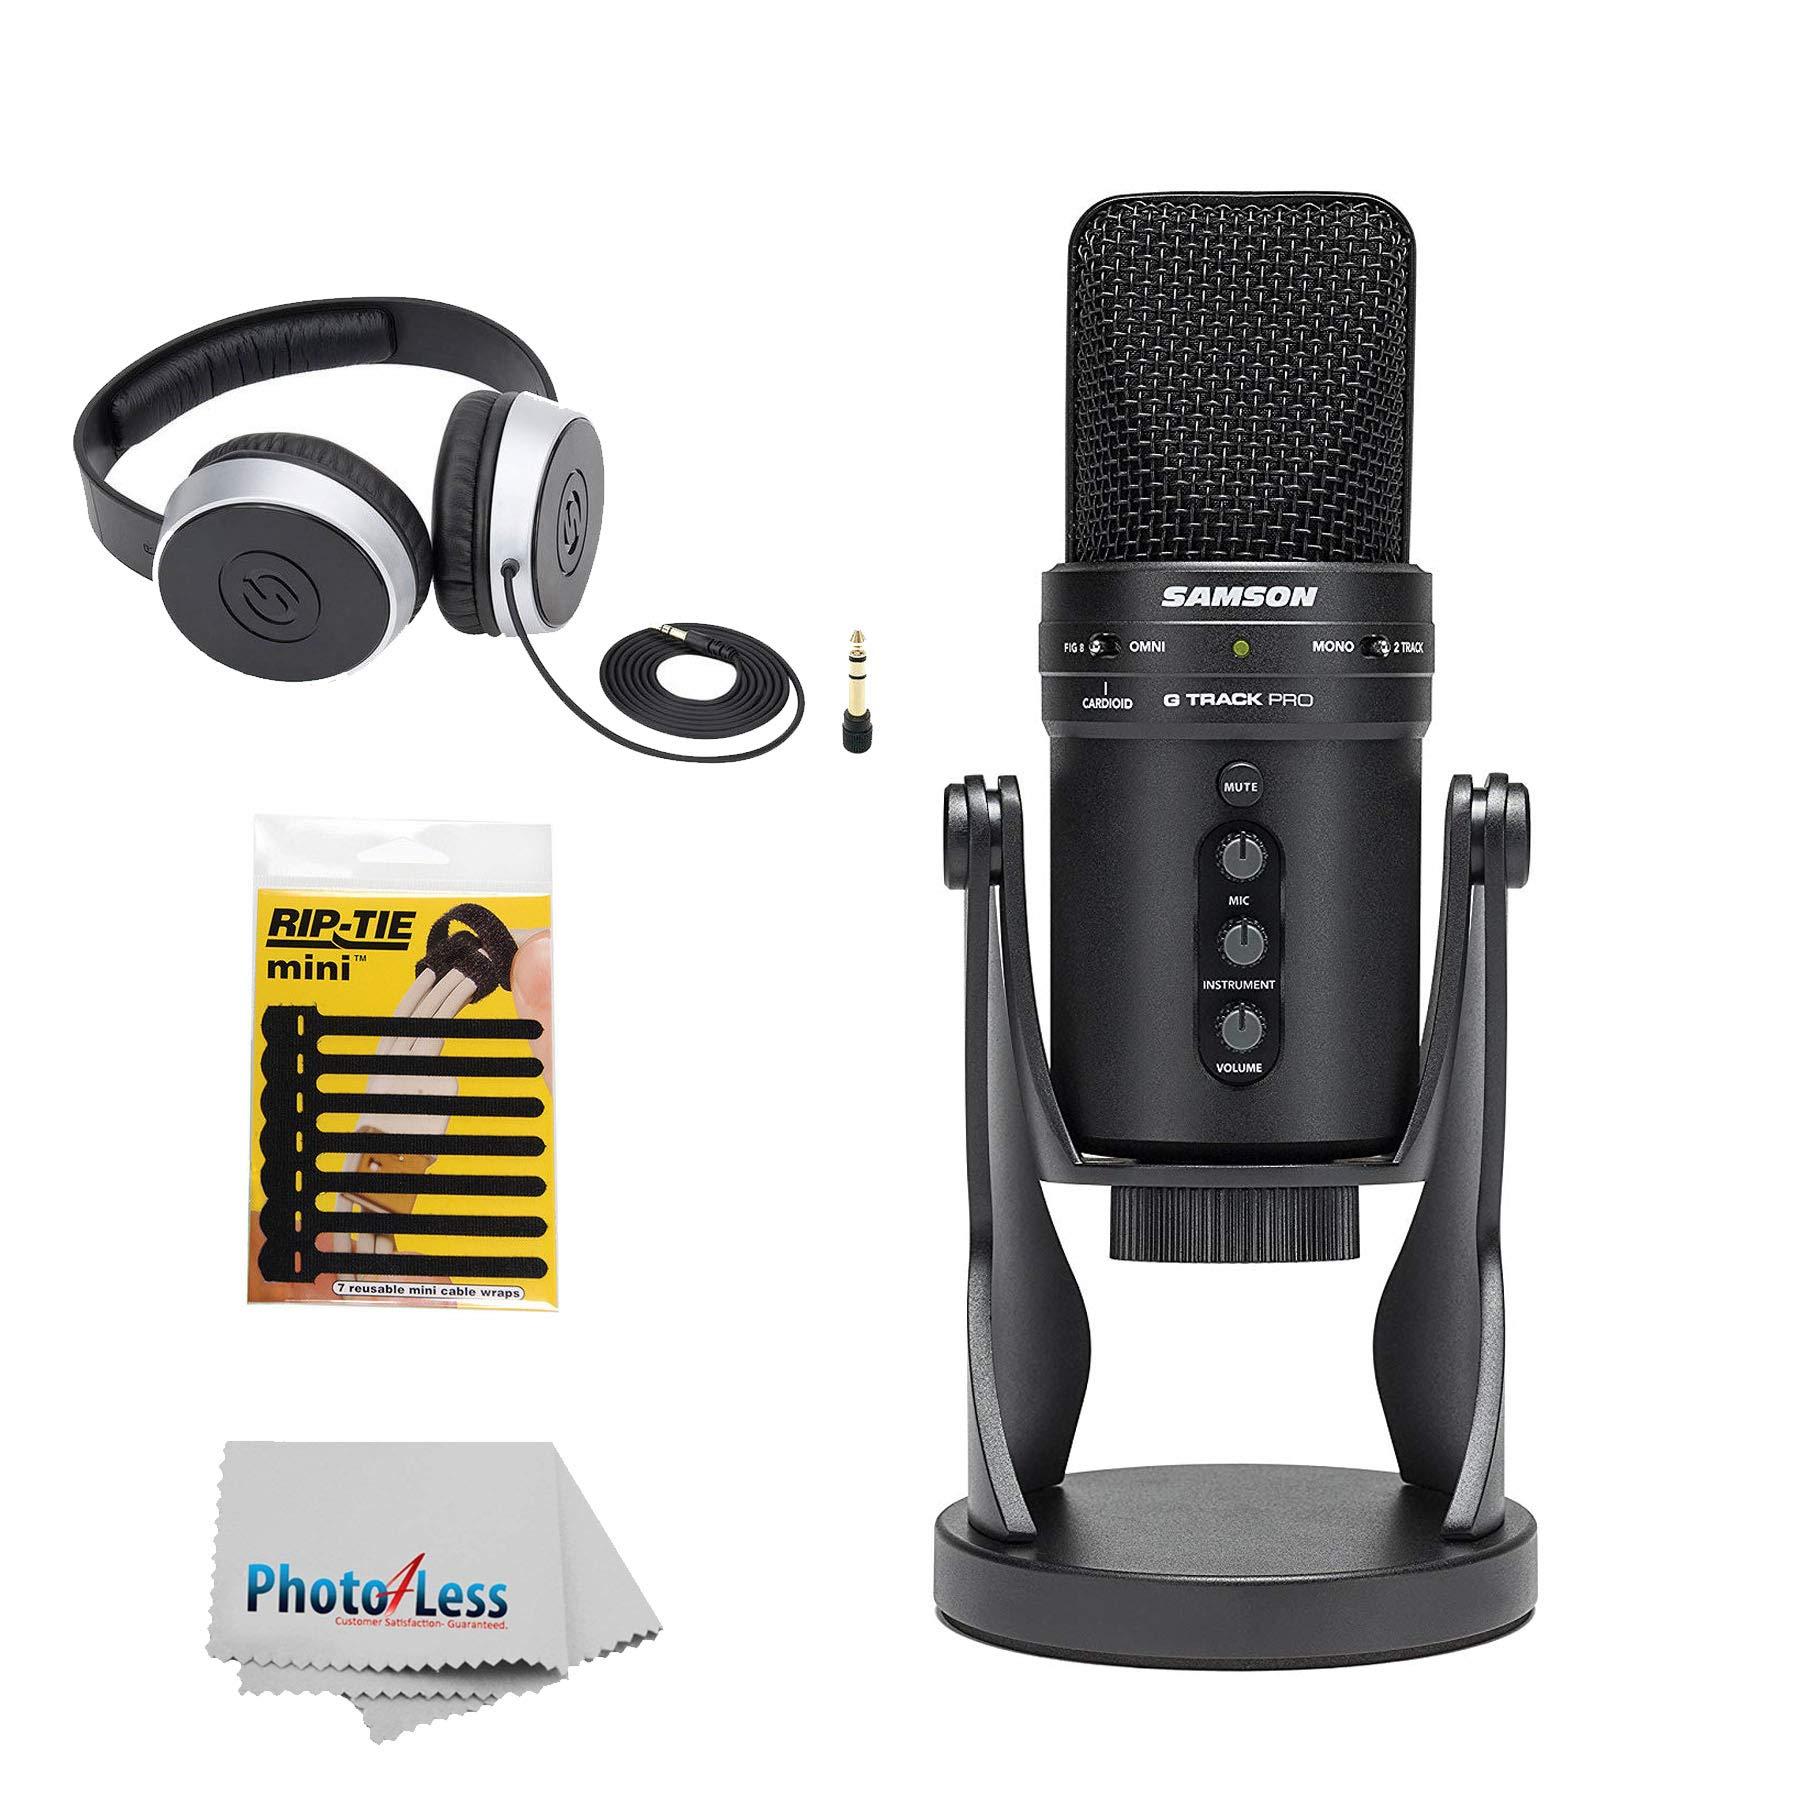 Samson G-track Pro Microfono Usb Profesional Con Interfaz De Audio Y Soporte De Choque + Auriculares + Paquete De 7 De M